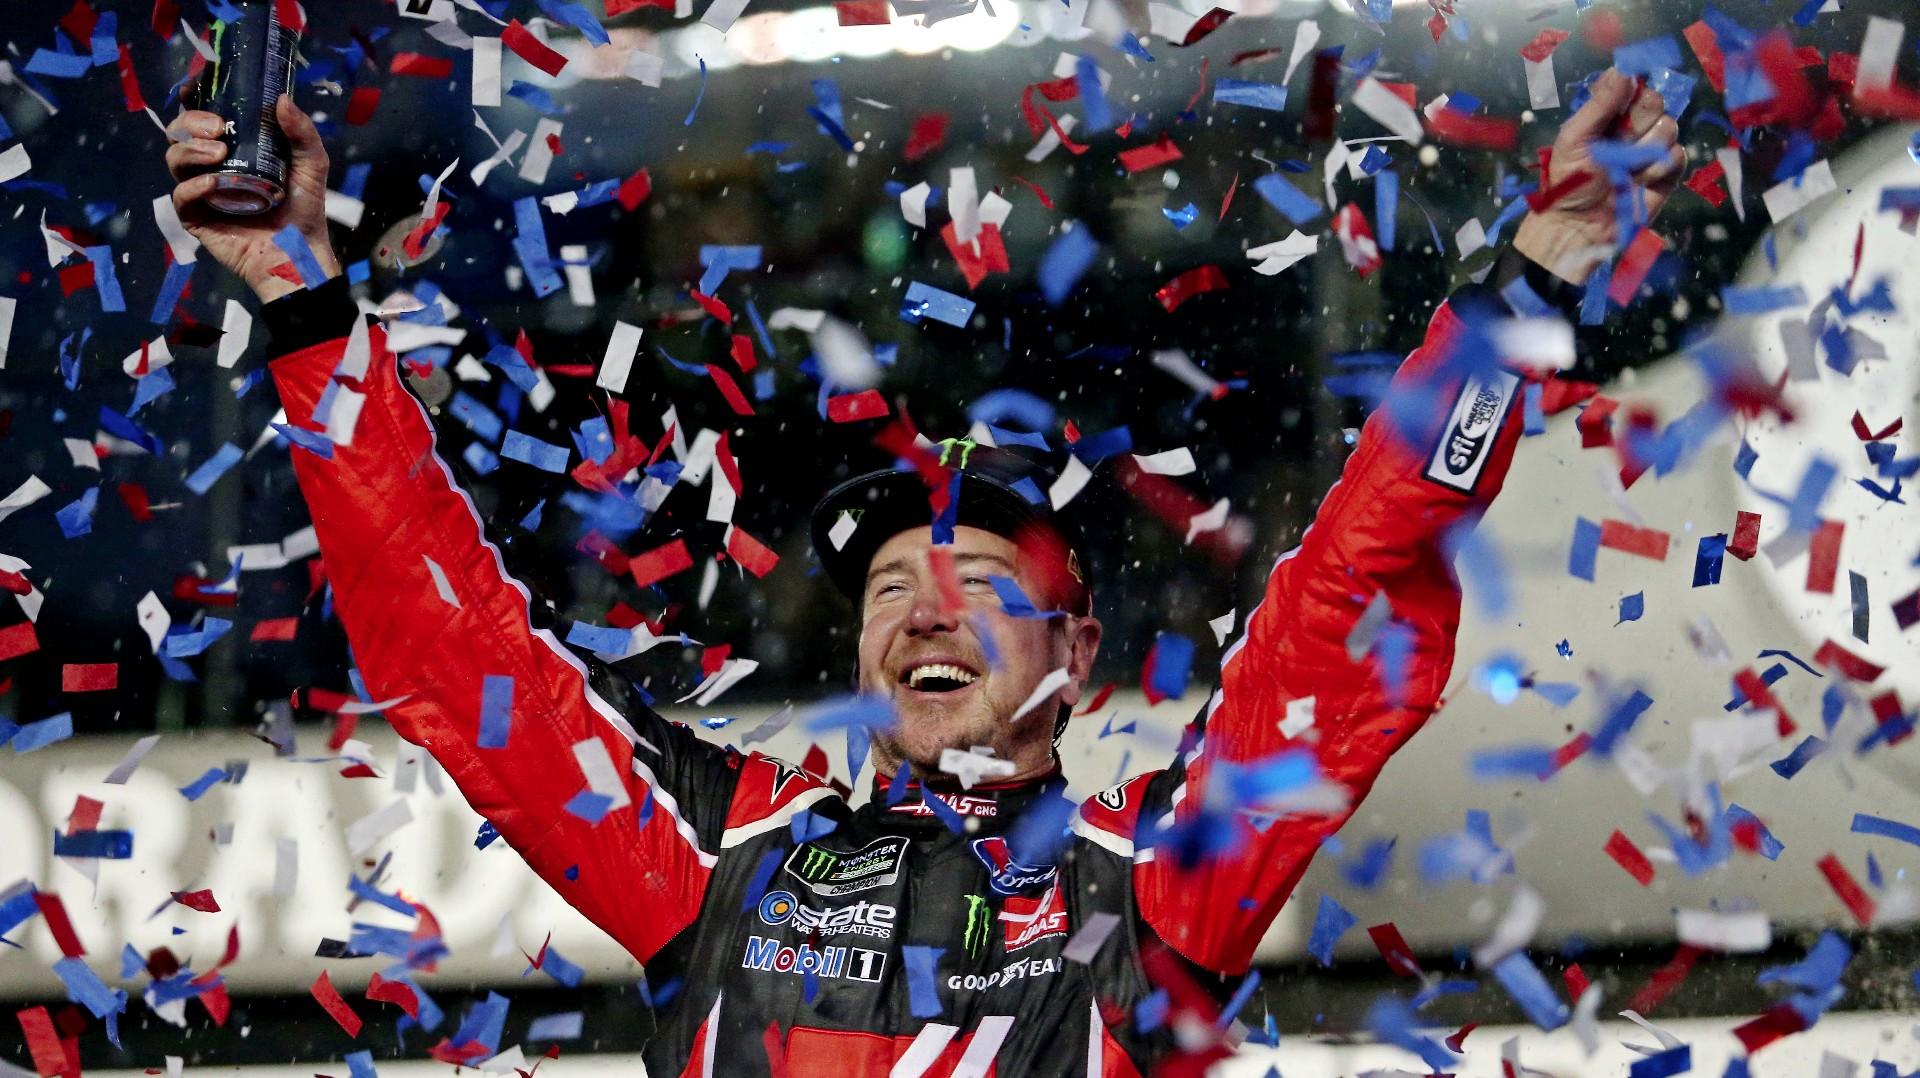 Kurt Busch wins crash-marred Daytona 500 with last-lap pass